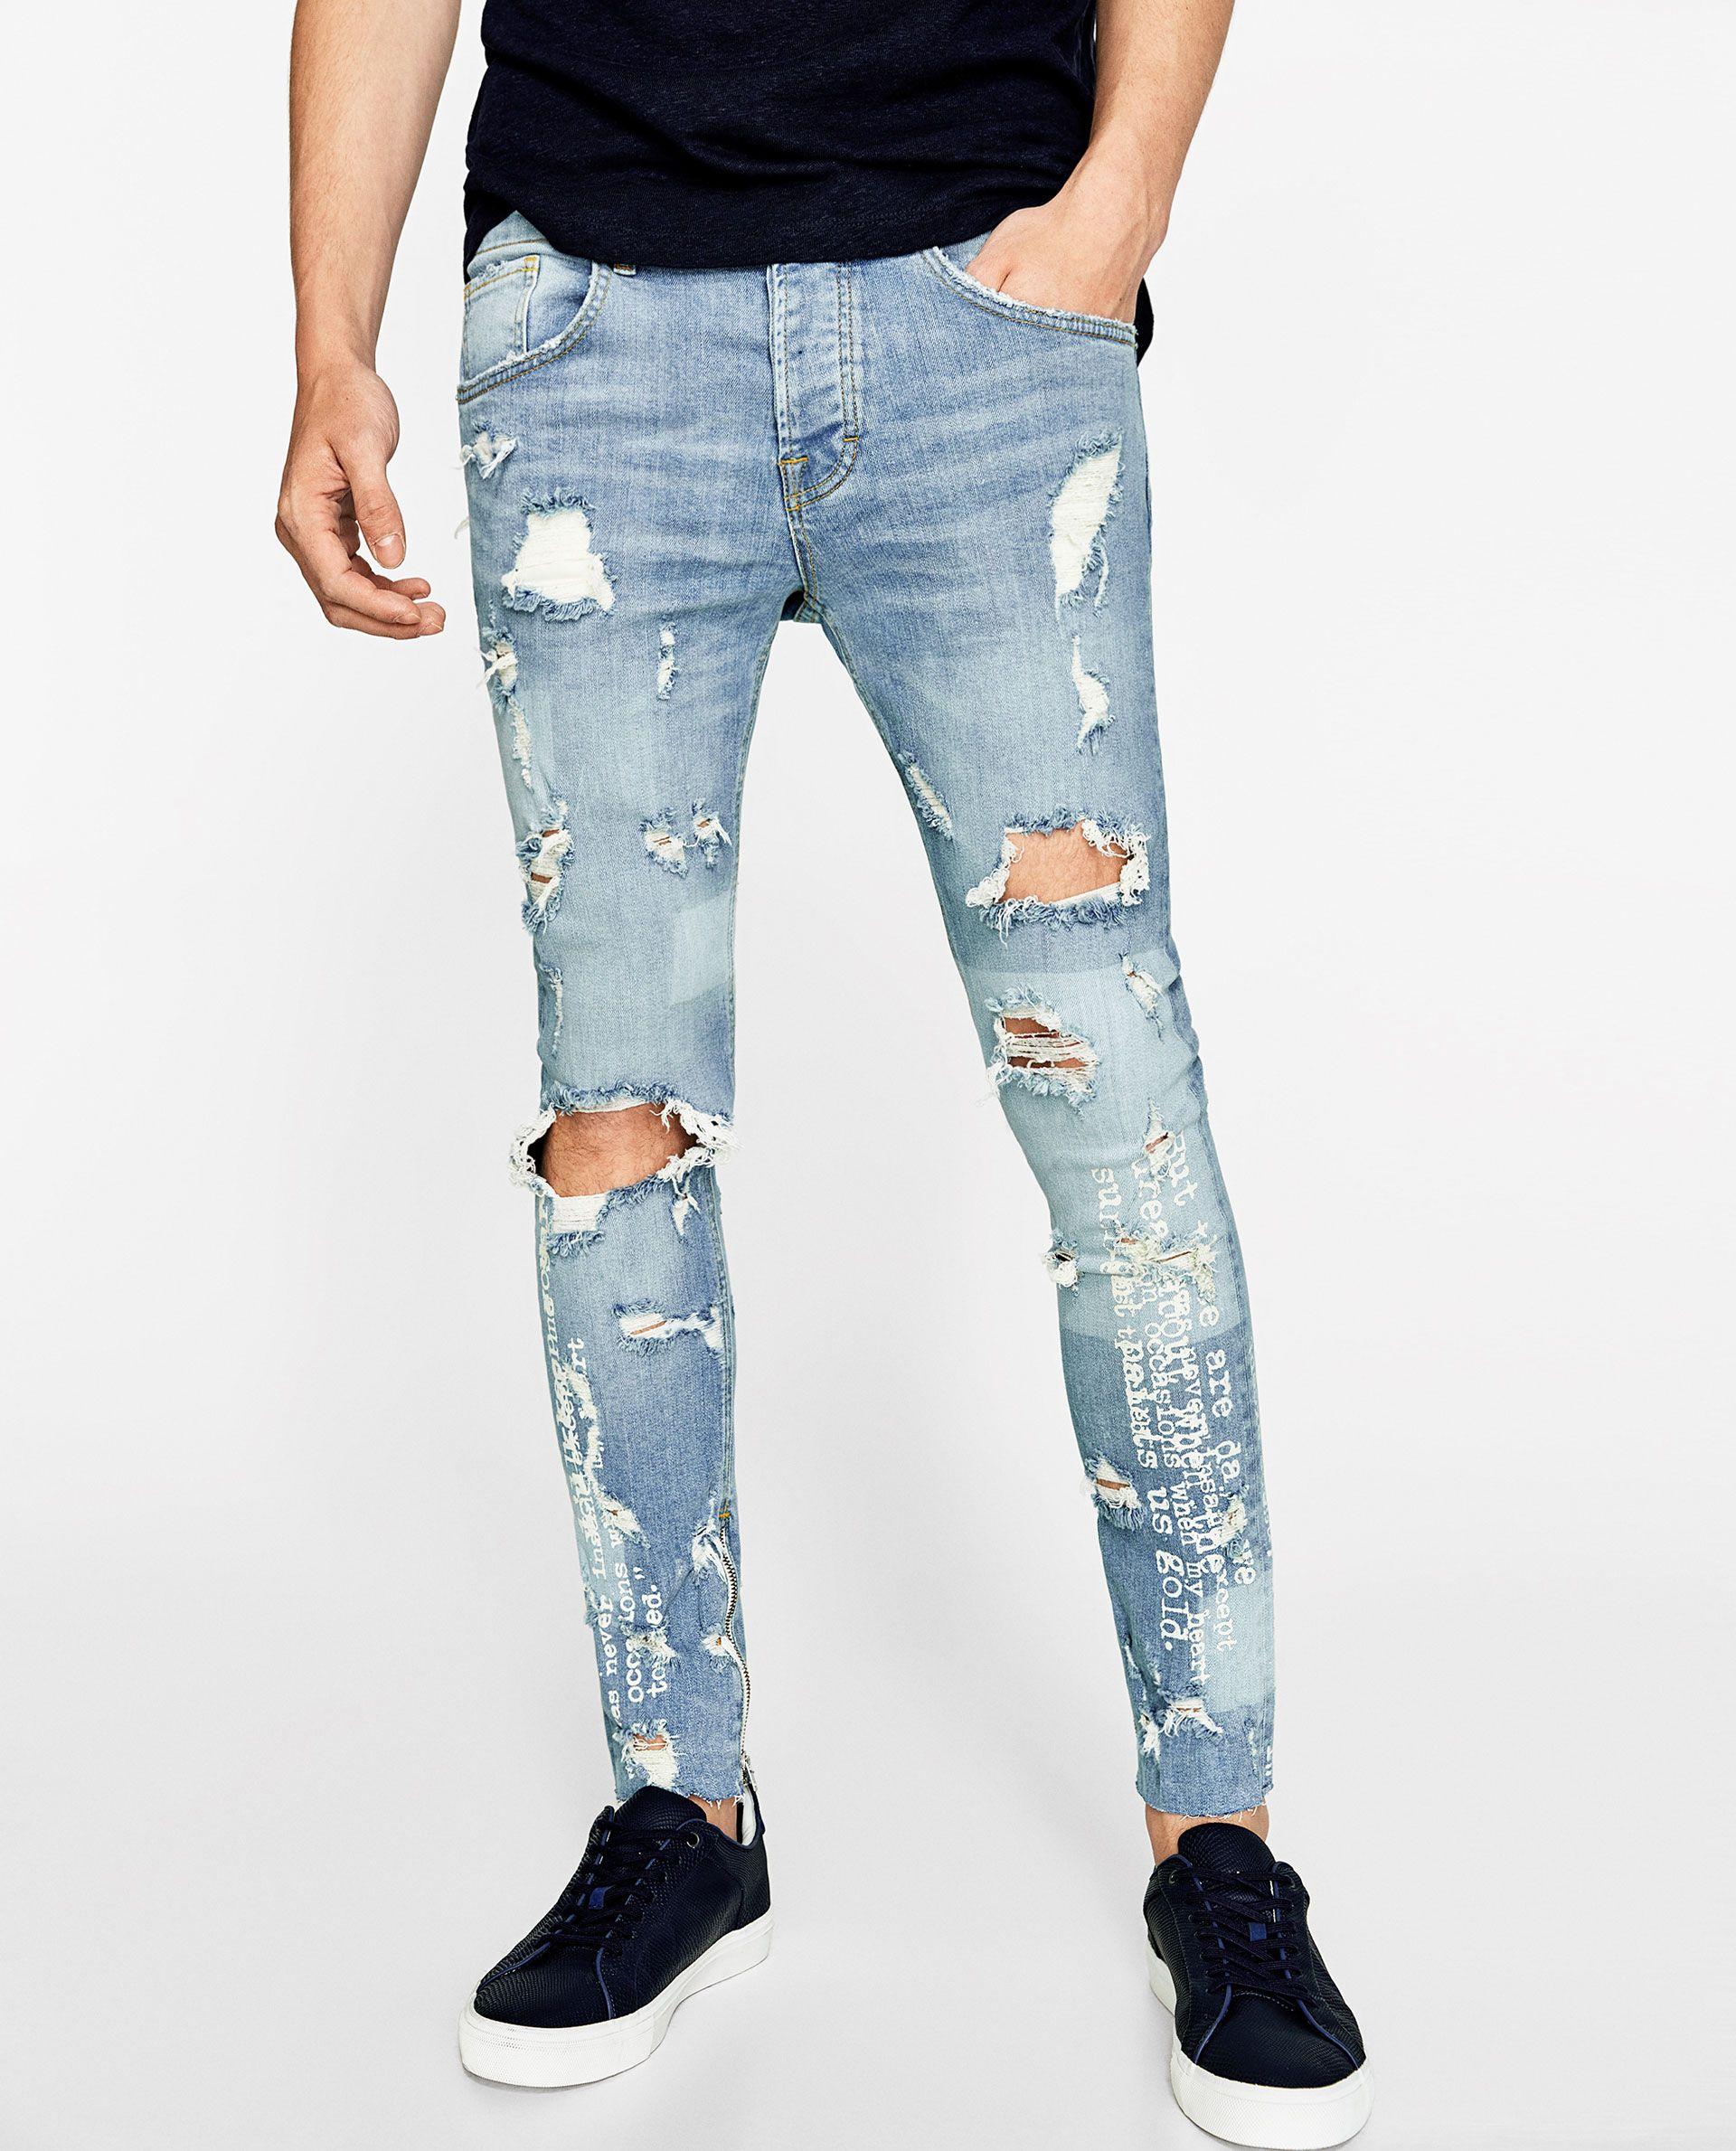 Imagen 2 de DENIM PRINTS de Zara | Pantalones de hombre moda